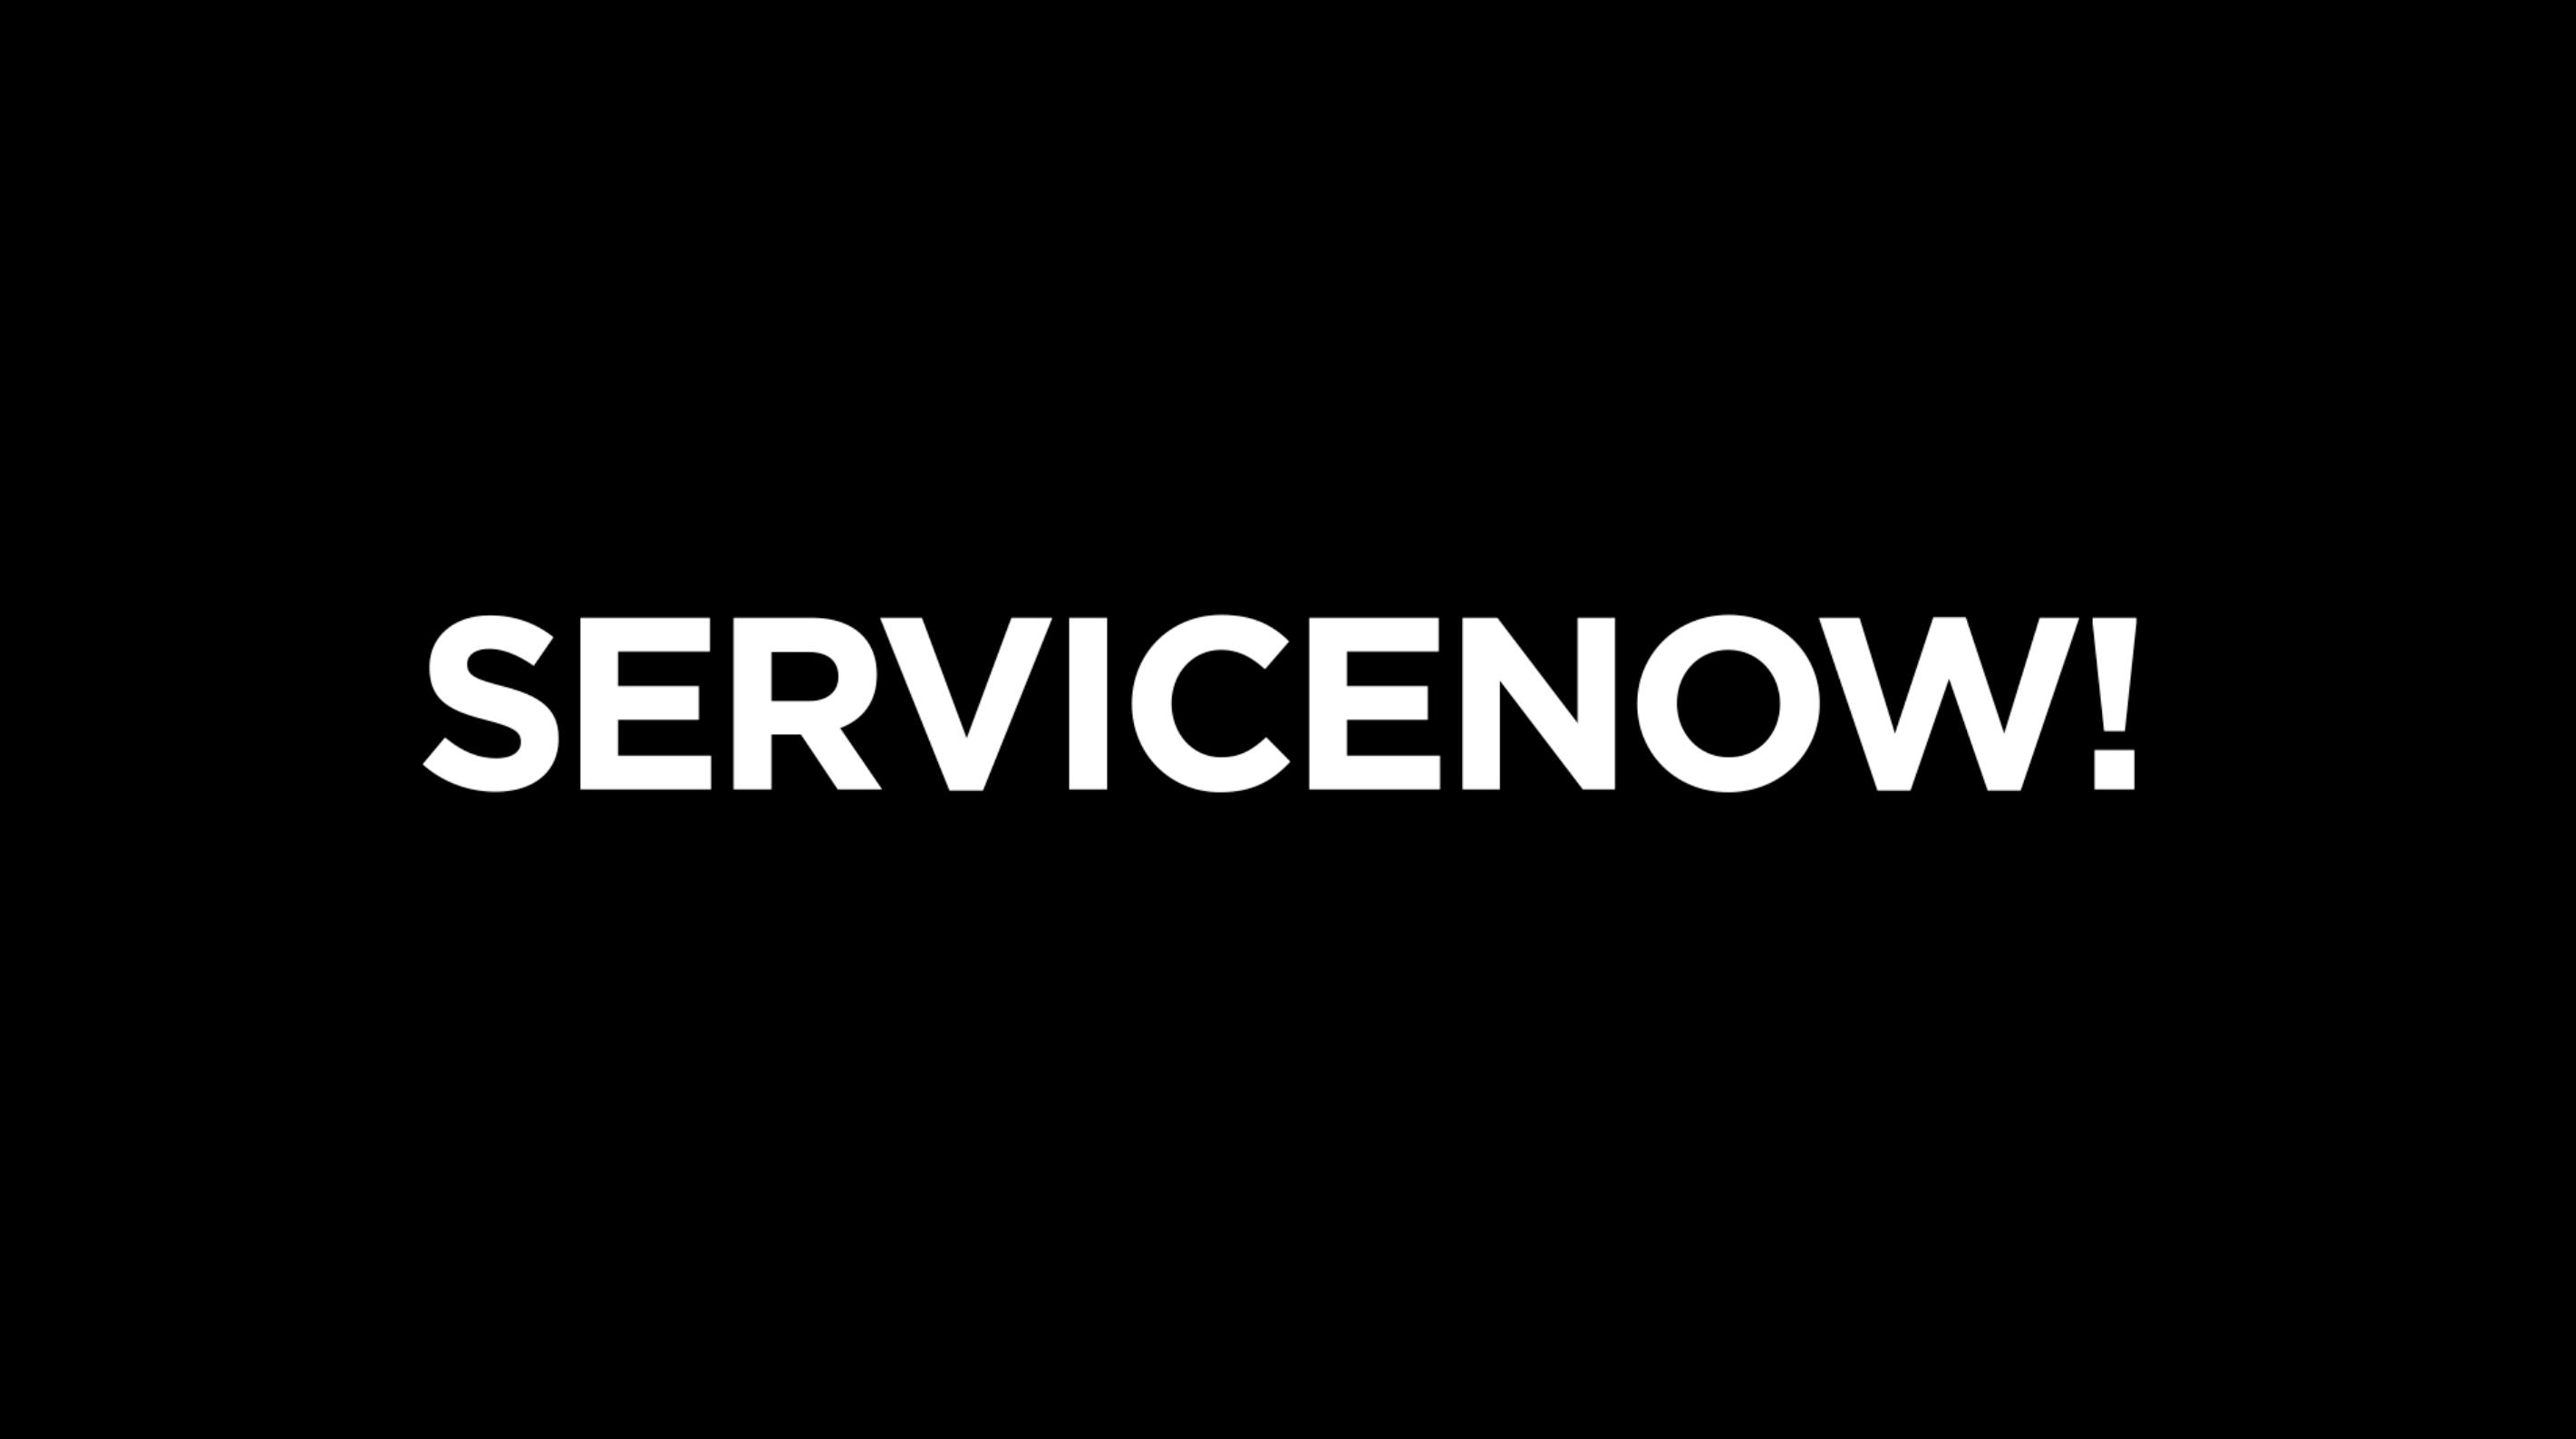 Qdemo_ServiceNow_Final